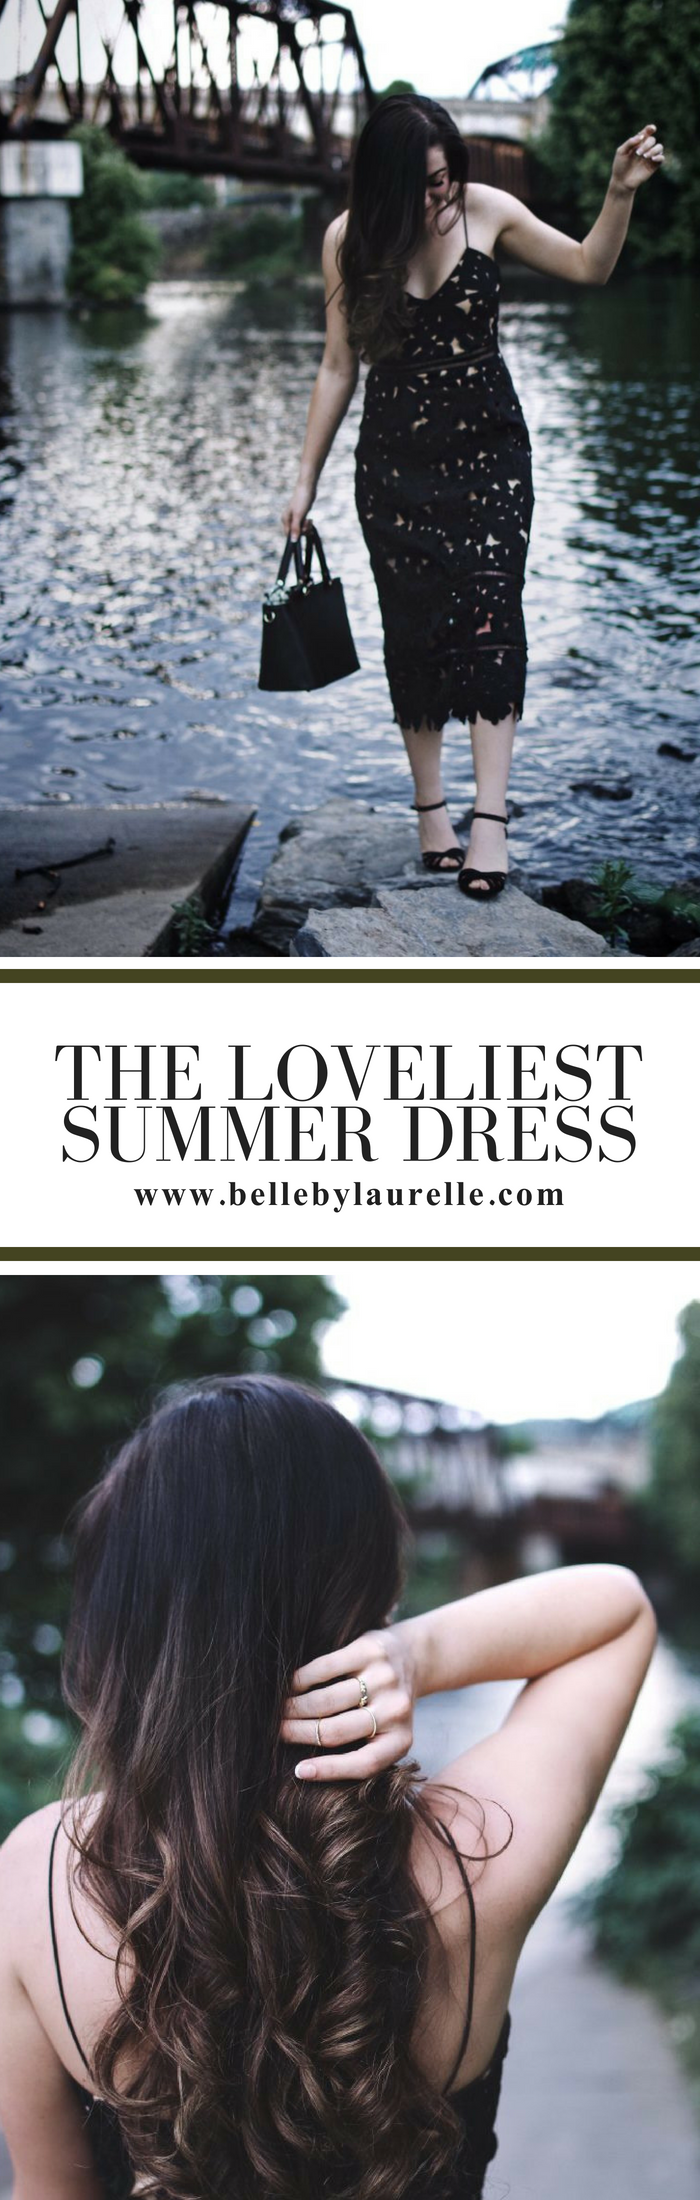 Belle by Laurelle Summer Fashion Sun Dress Event Occasion Fashion Blog